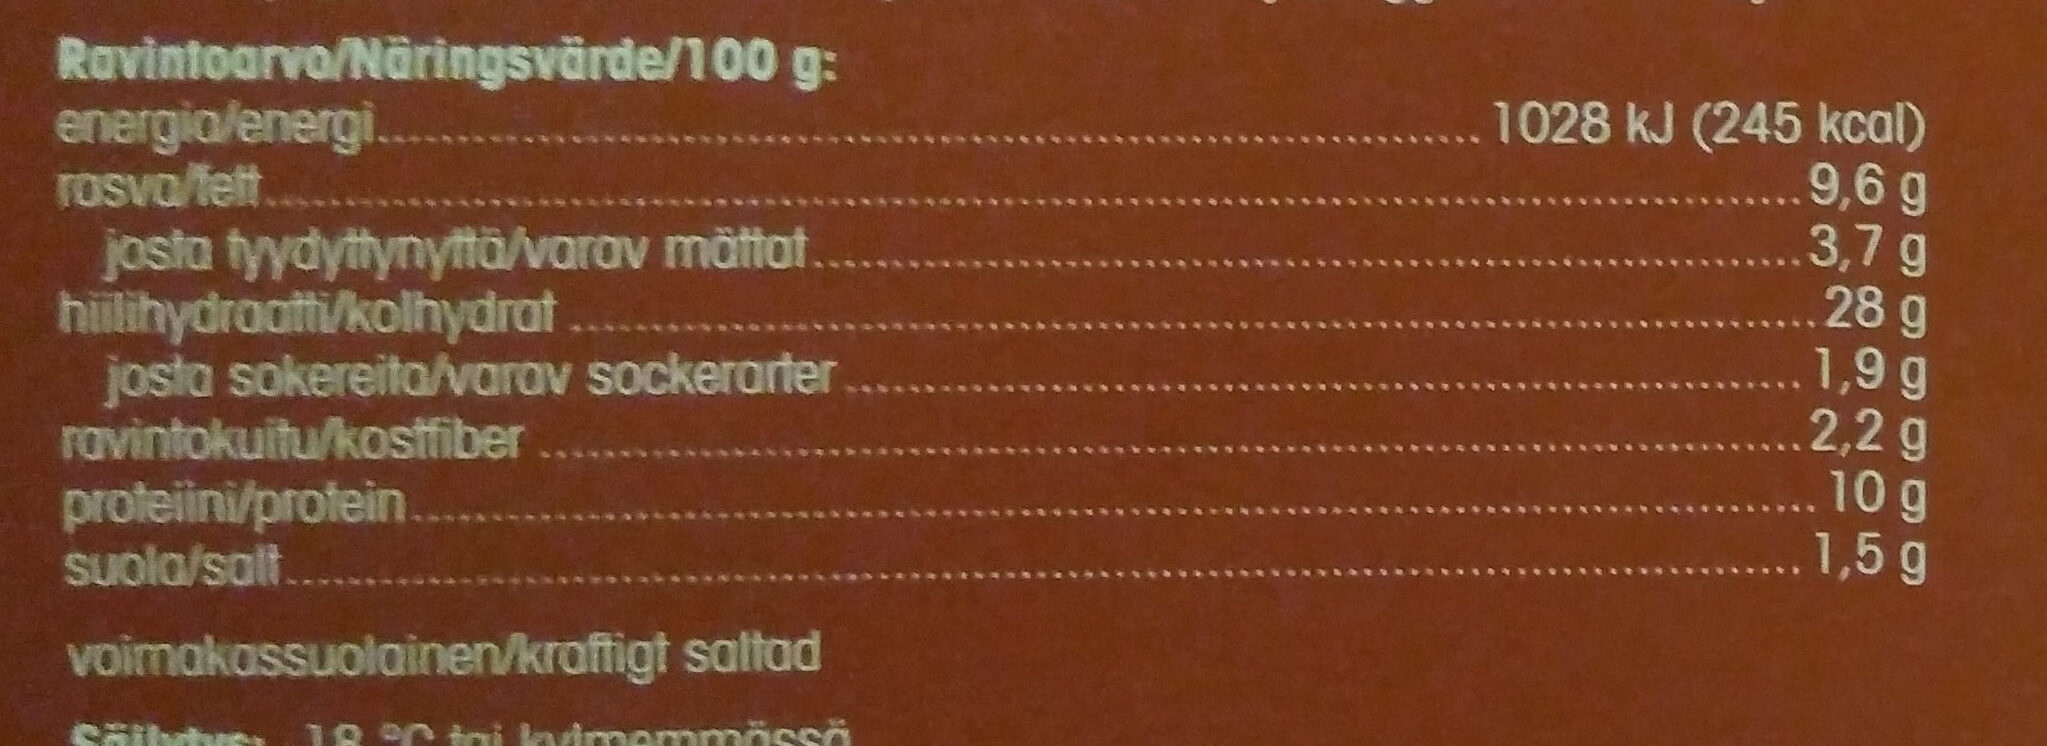 Salami kiviuunipizza - Nutrition facts - fi